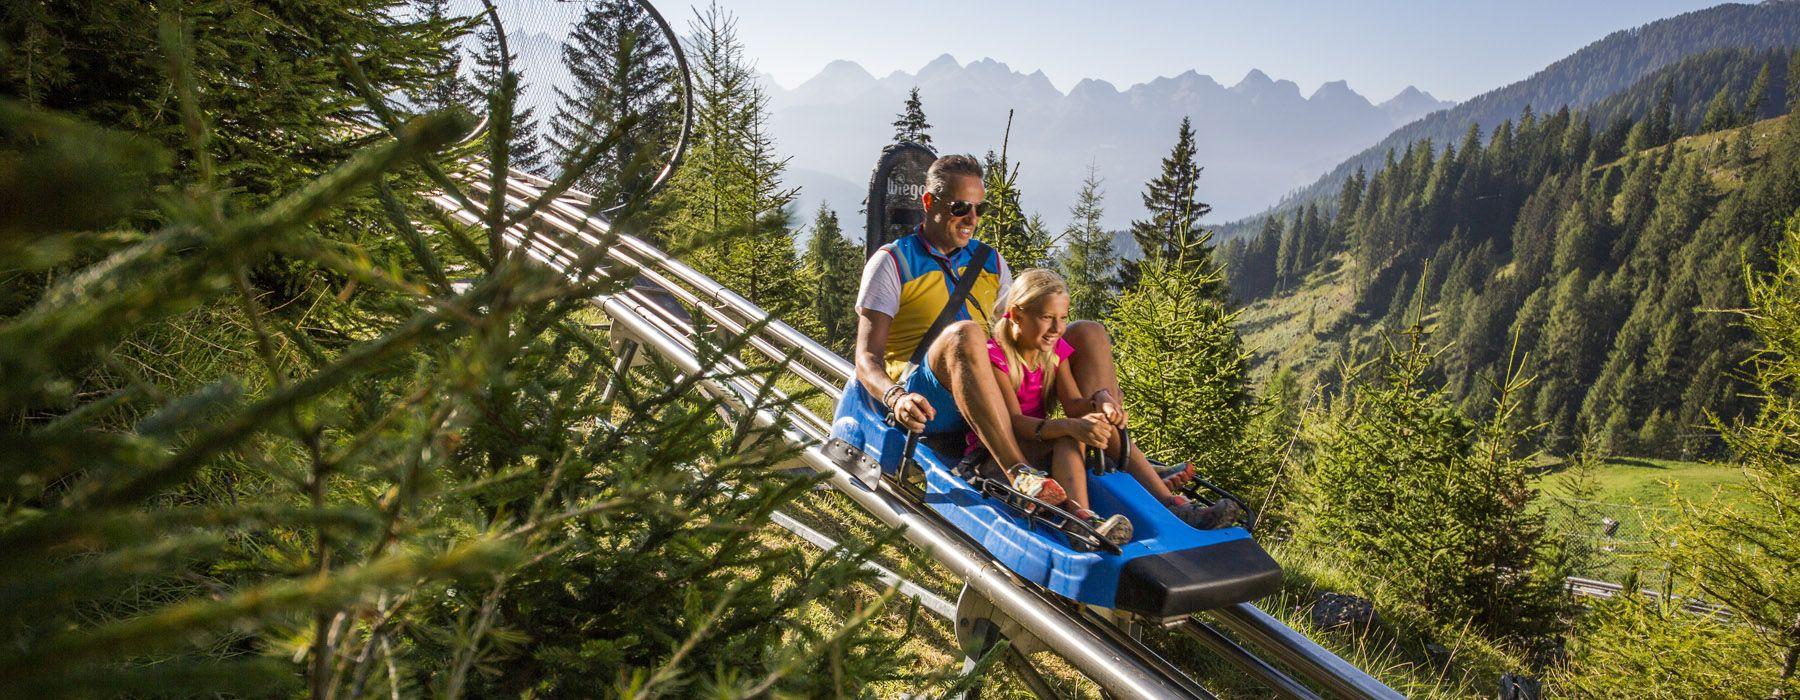 bob su rotaia alpine-coaster-gardon-latemar-trentino-val-di-fiemme